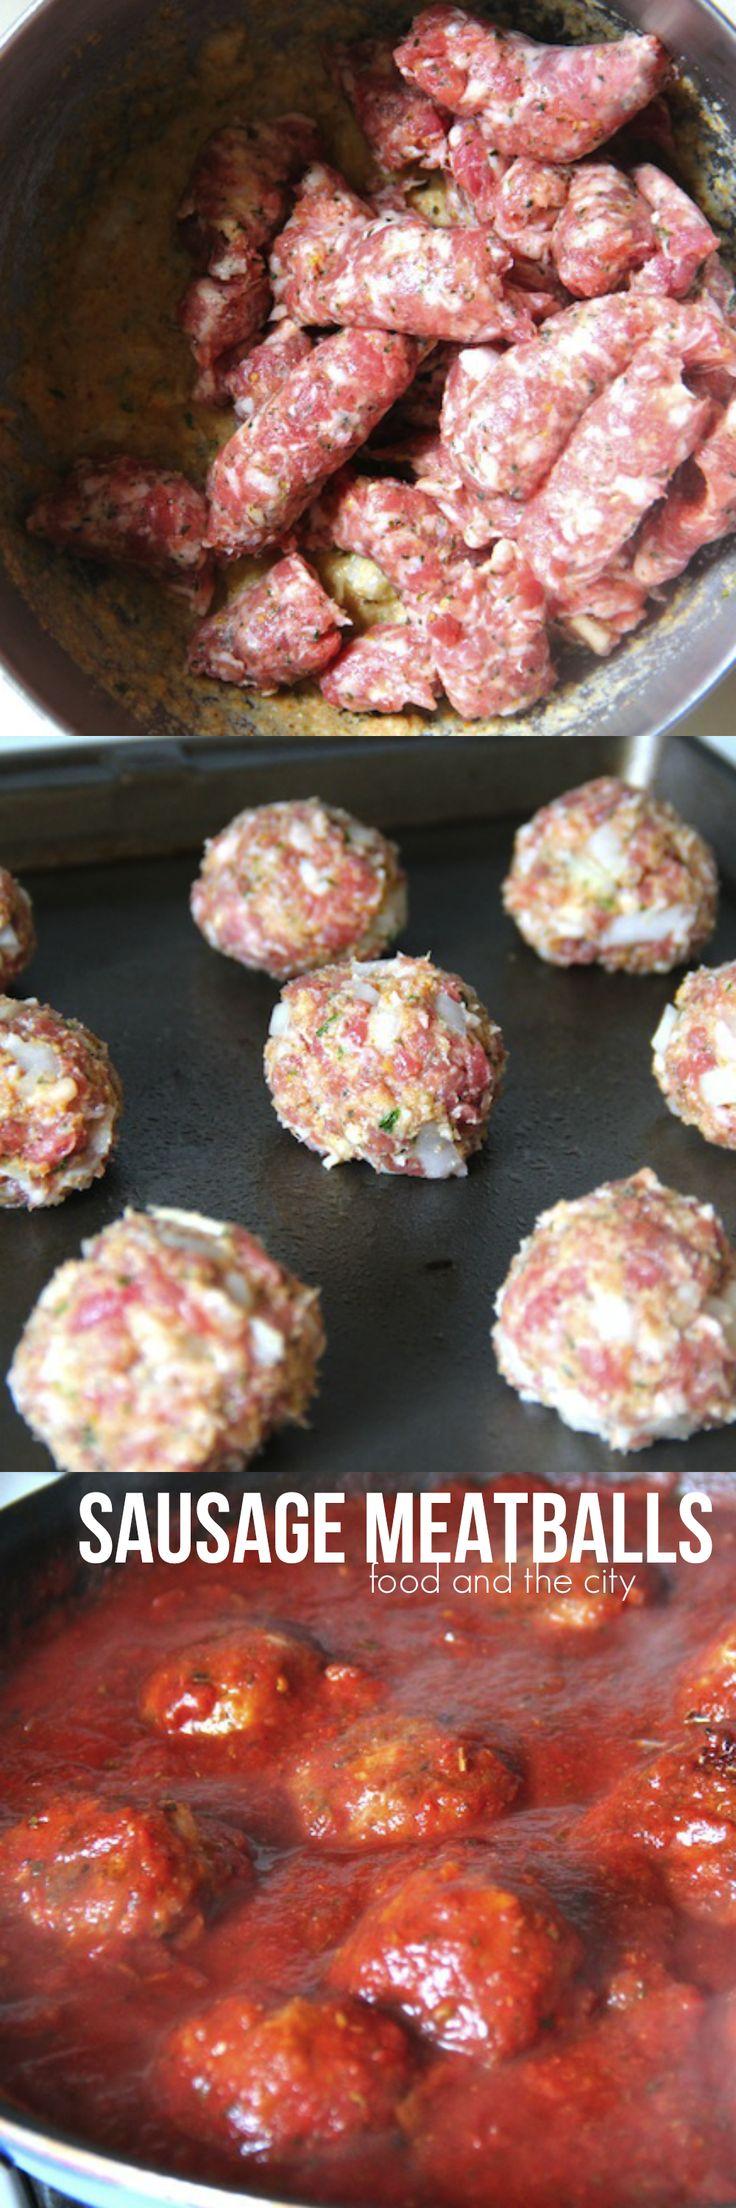 Sausage Meatballs like ma' used to make! | Food and the City